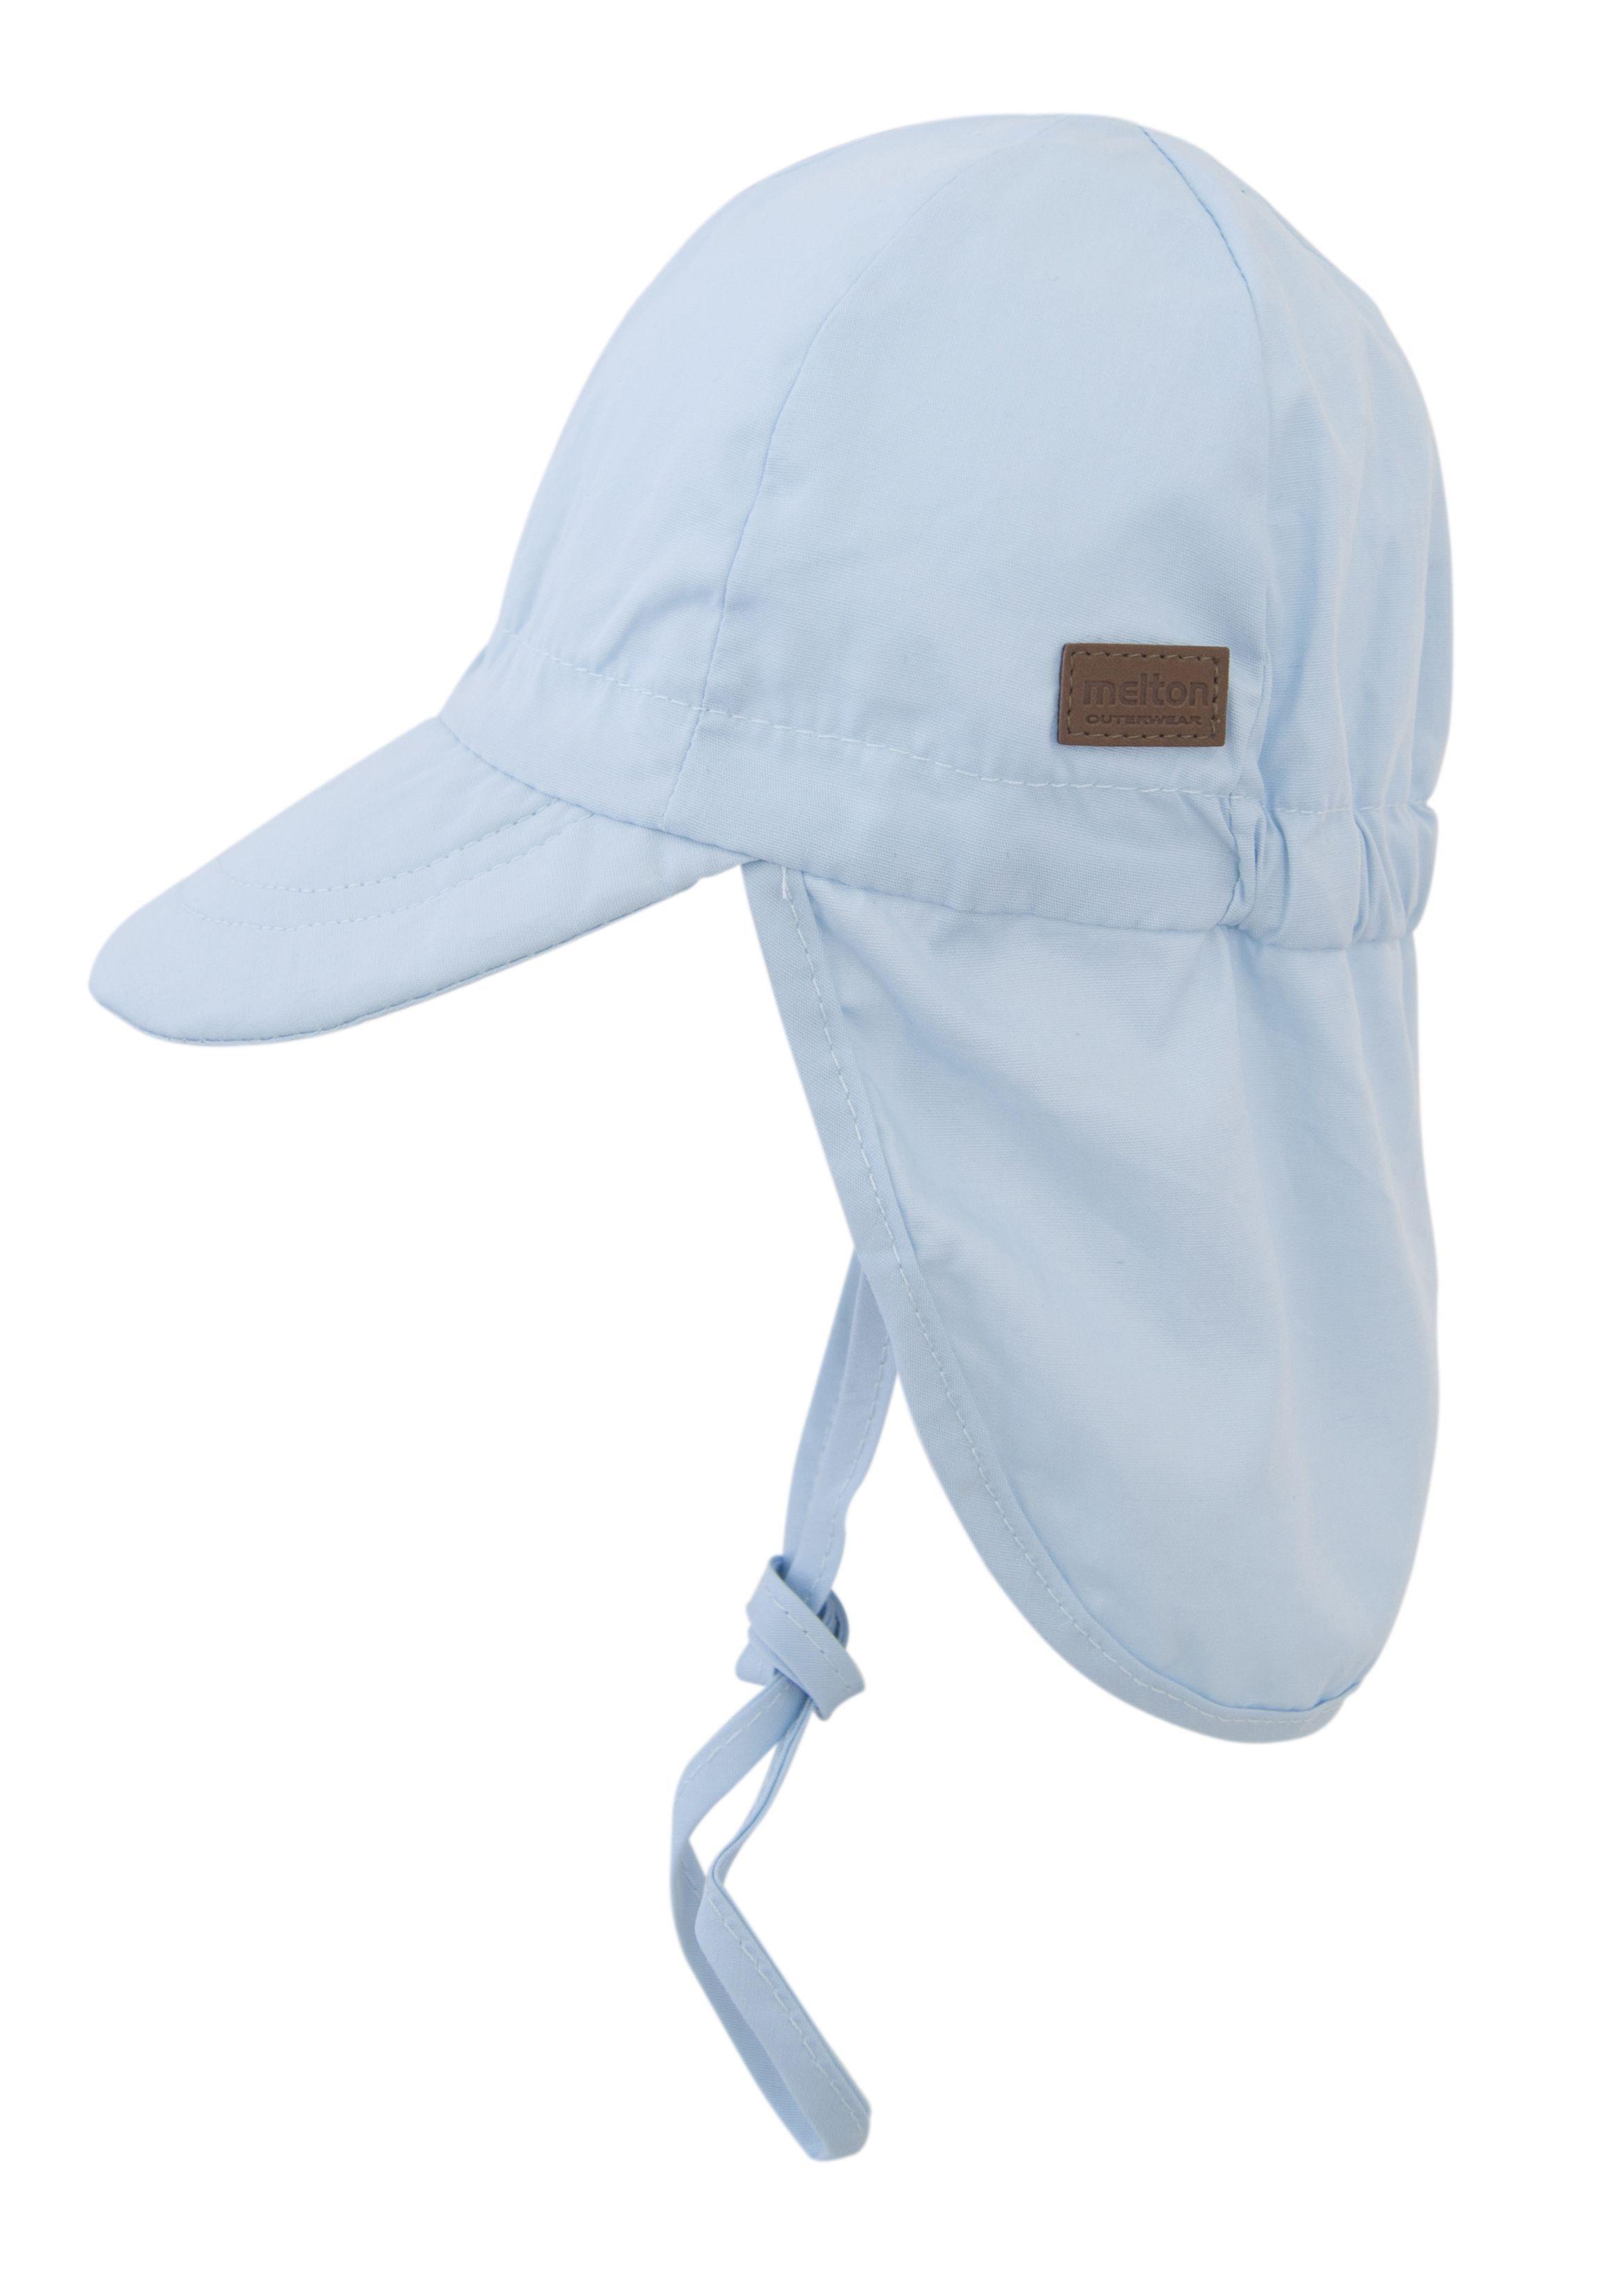 Image of   Legionærhat fra Melton UV30+ - Cap - Dusty Baby Blue